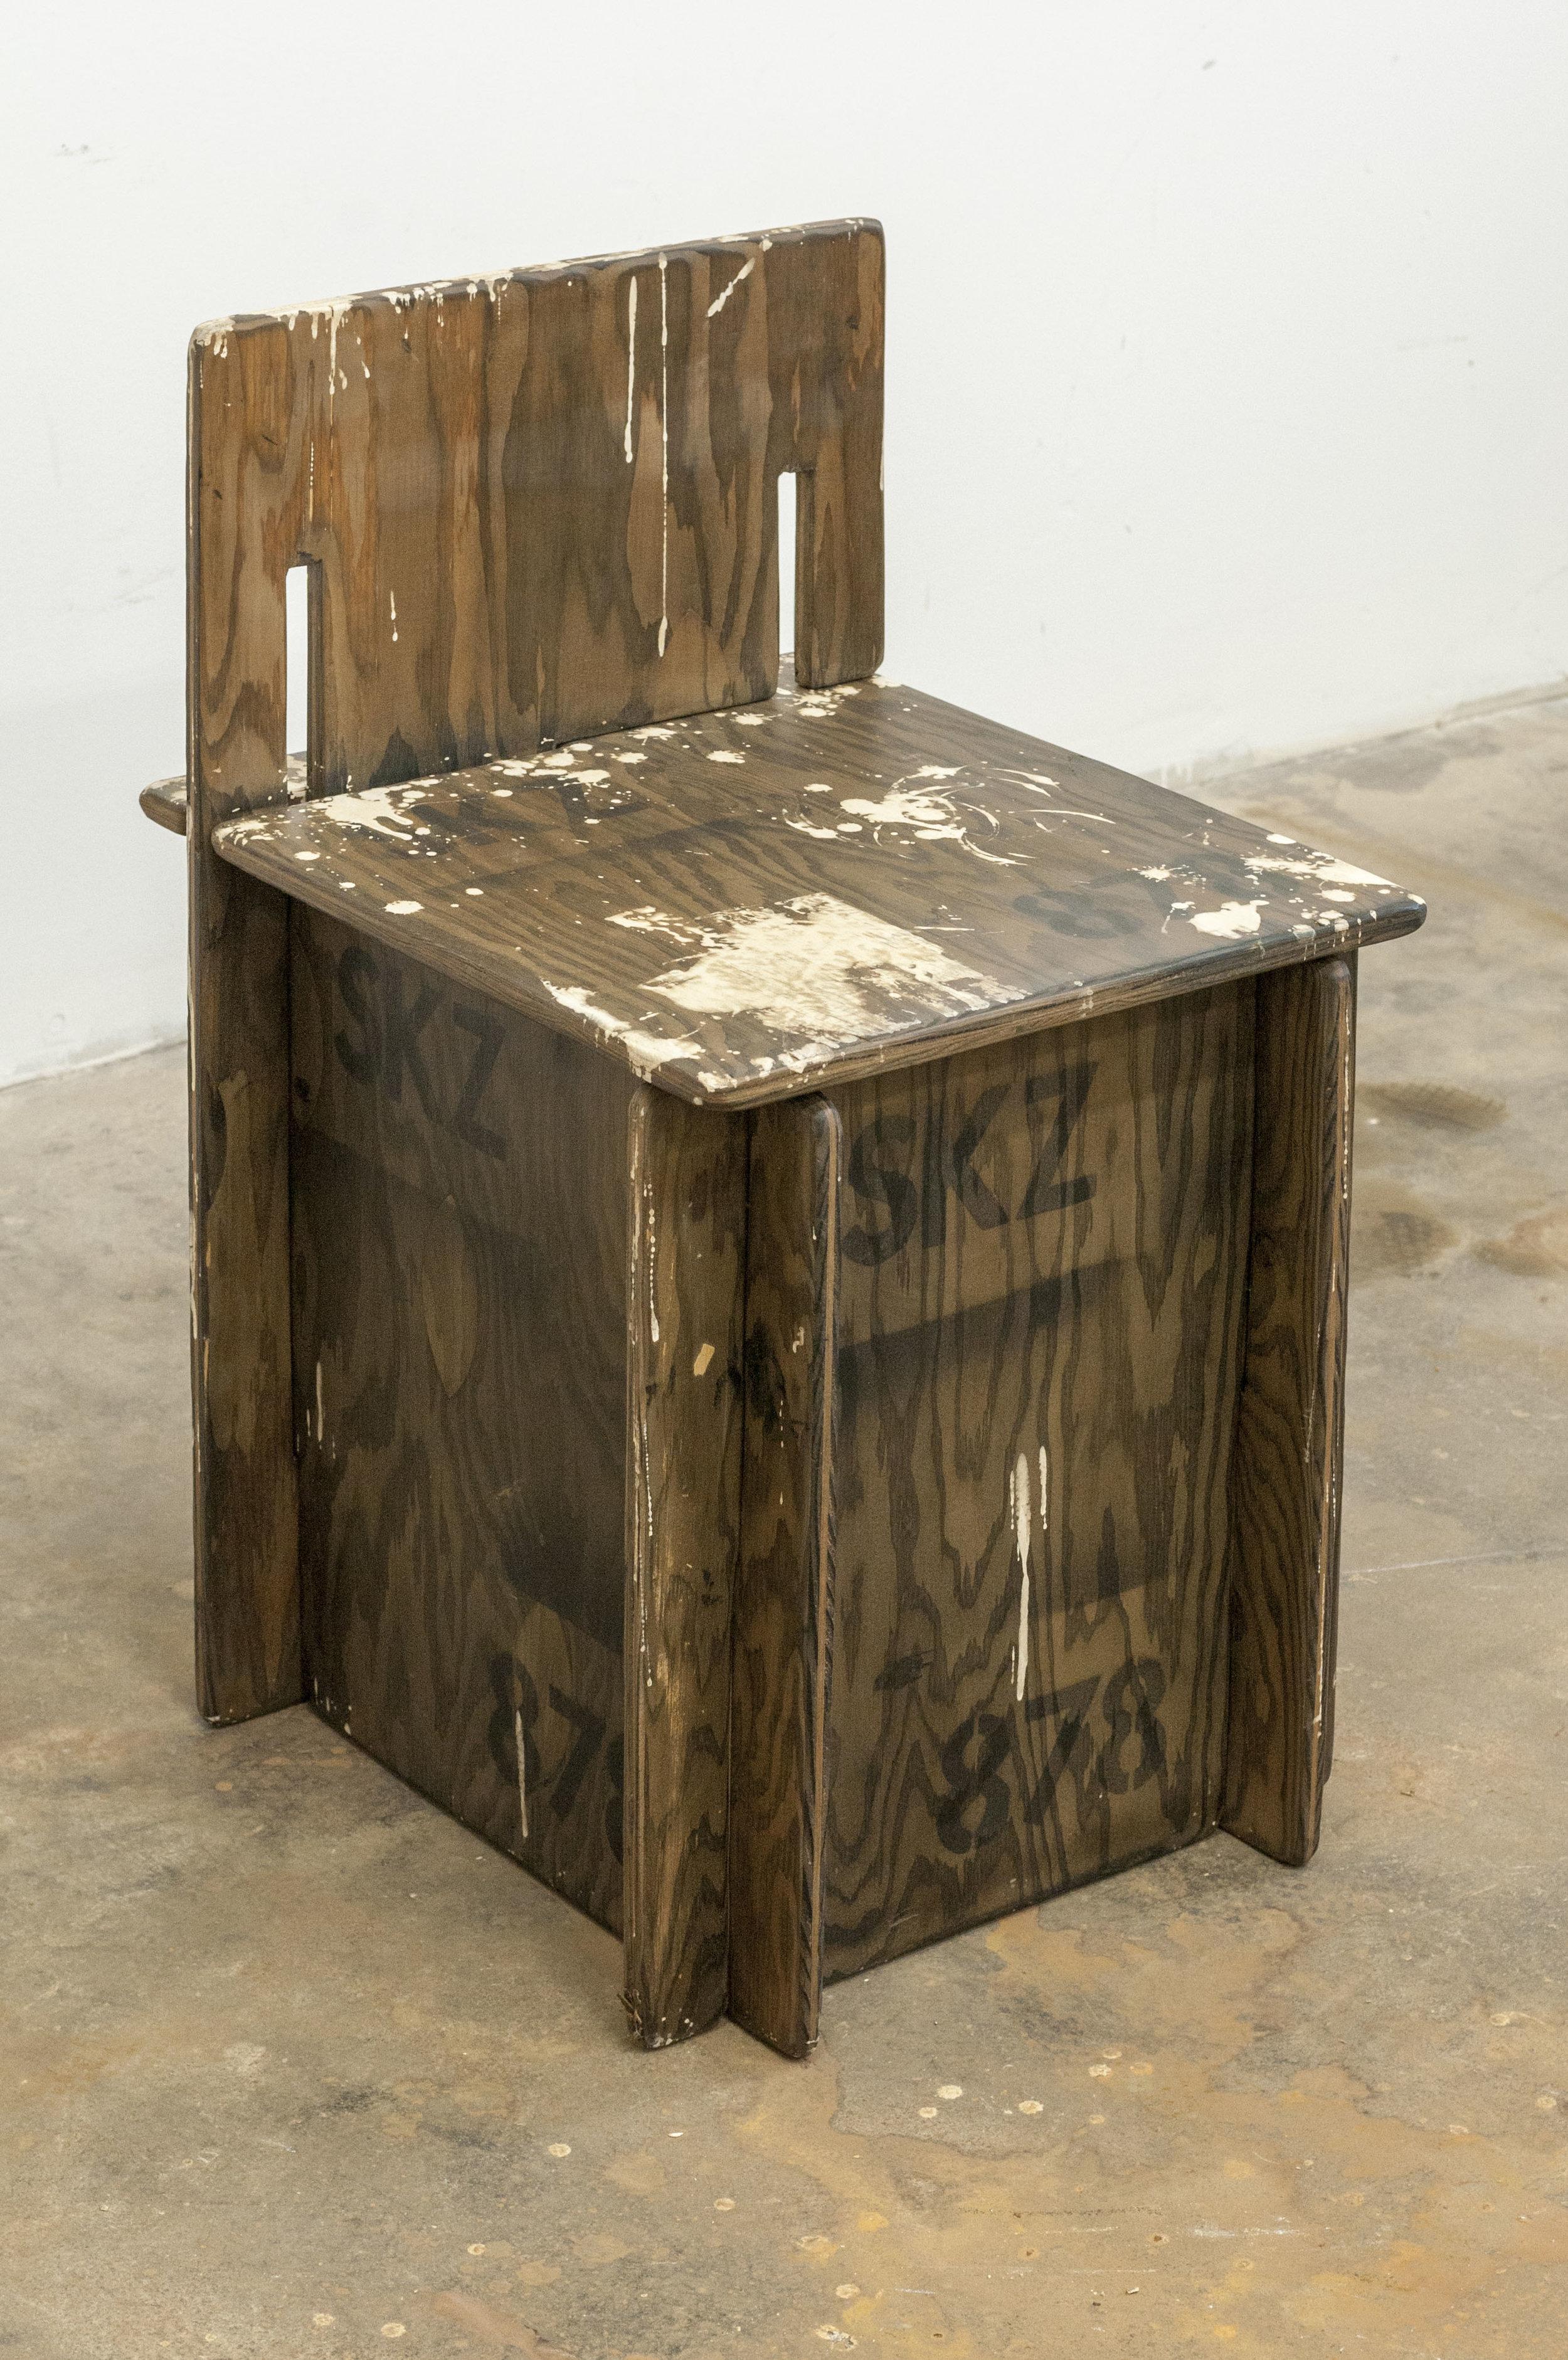 Dan Levenson  SKZ Student Chair Number 878 , 2016 wood, oil 74 x 49 x 43 cm 29 1/8 x 19 9/32 x 16 15/16 inches